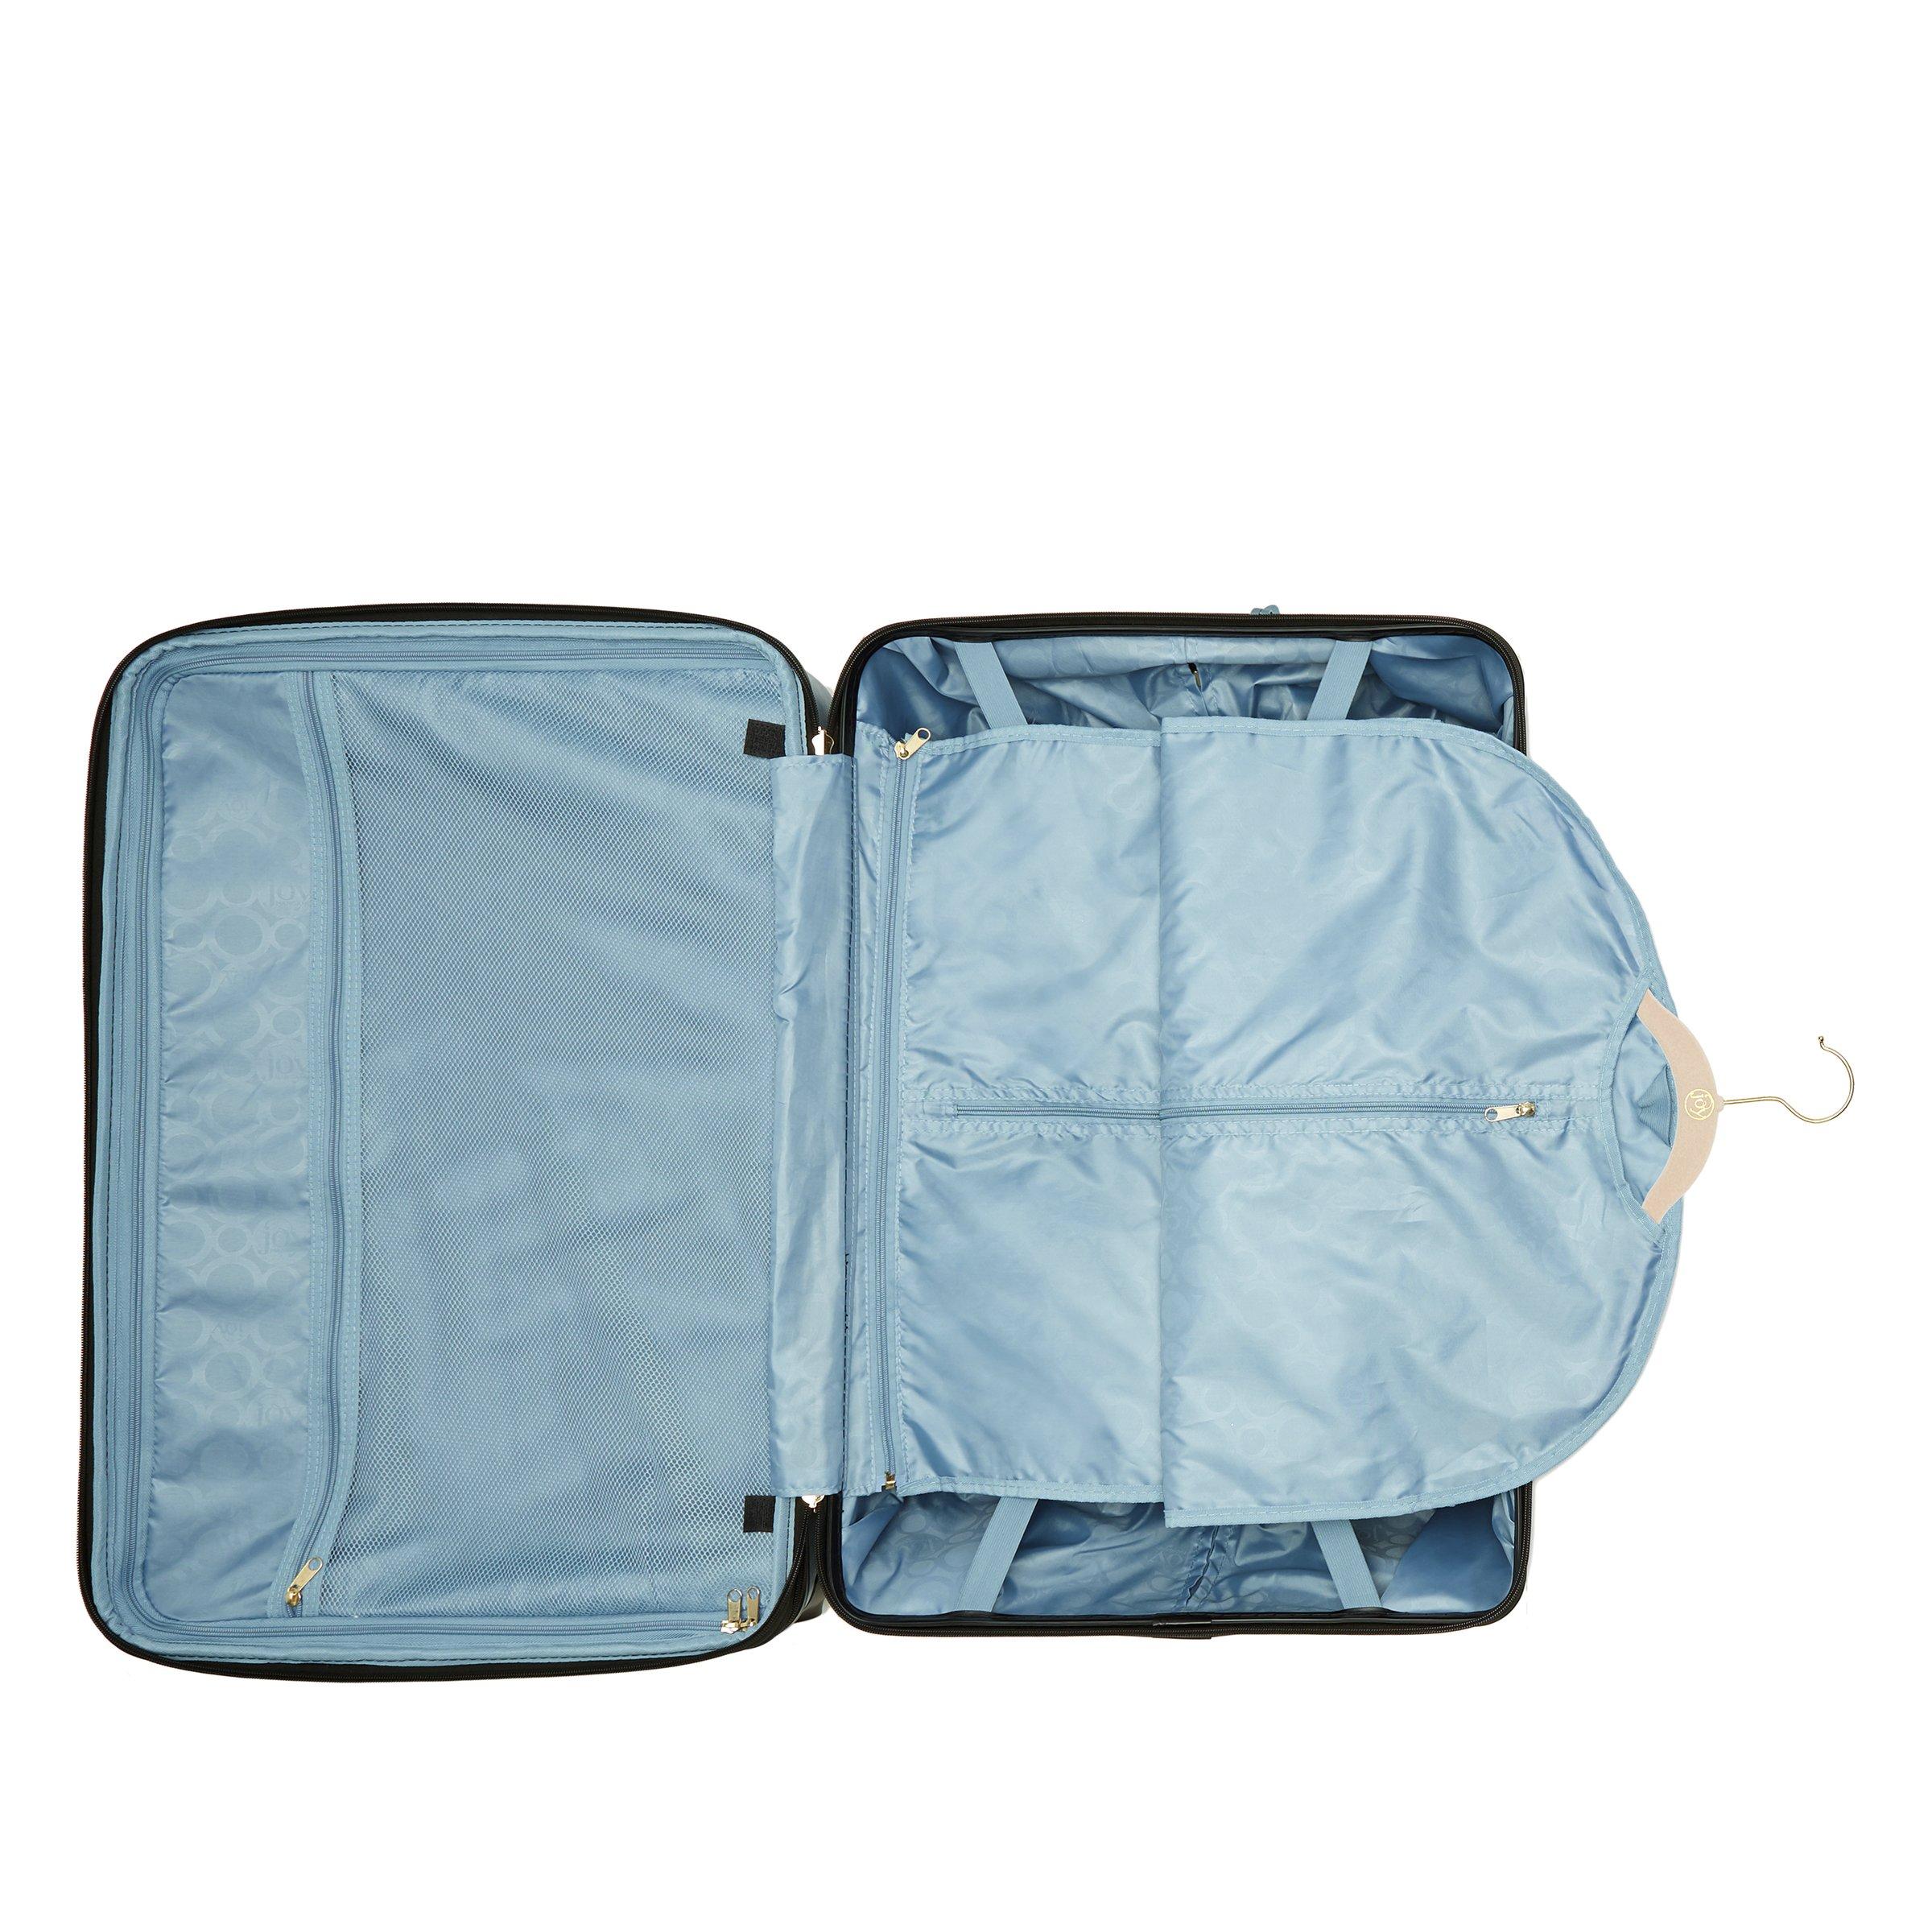 21caacb148c4 ایگرد - خرید از آمازون   Joy Mangano Hardside Medium Luggage (Carry ...